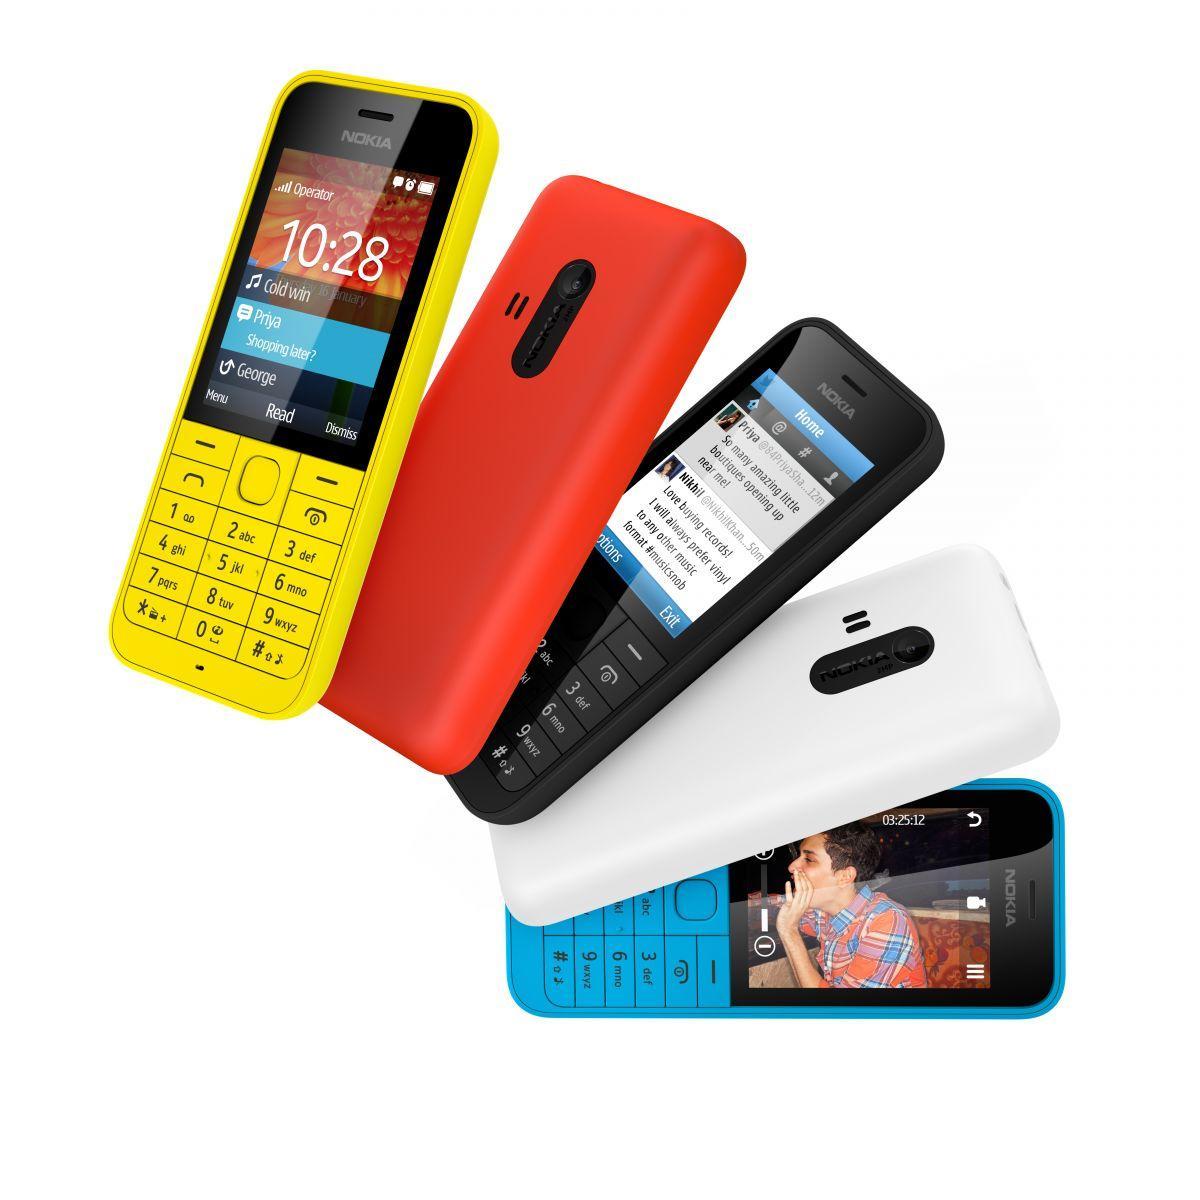 Nokia lanserte også billigmobilen Nokia 220.Foto: Nokia